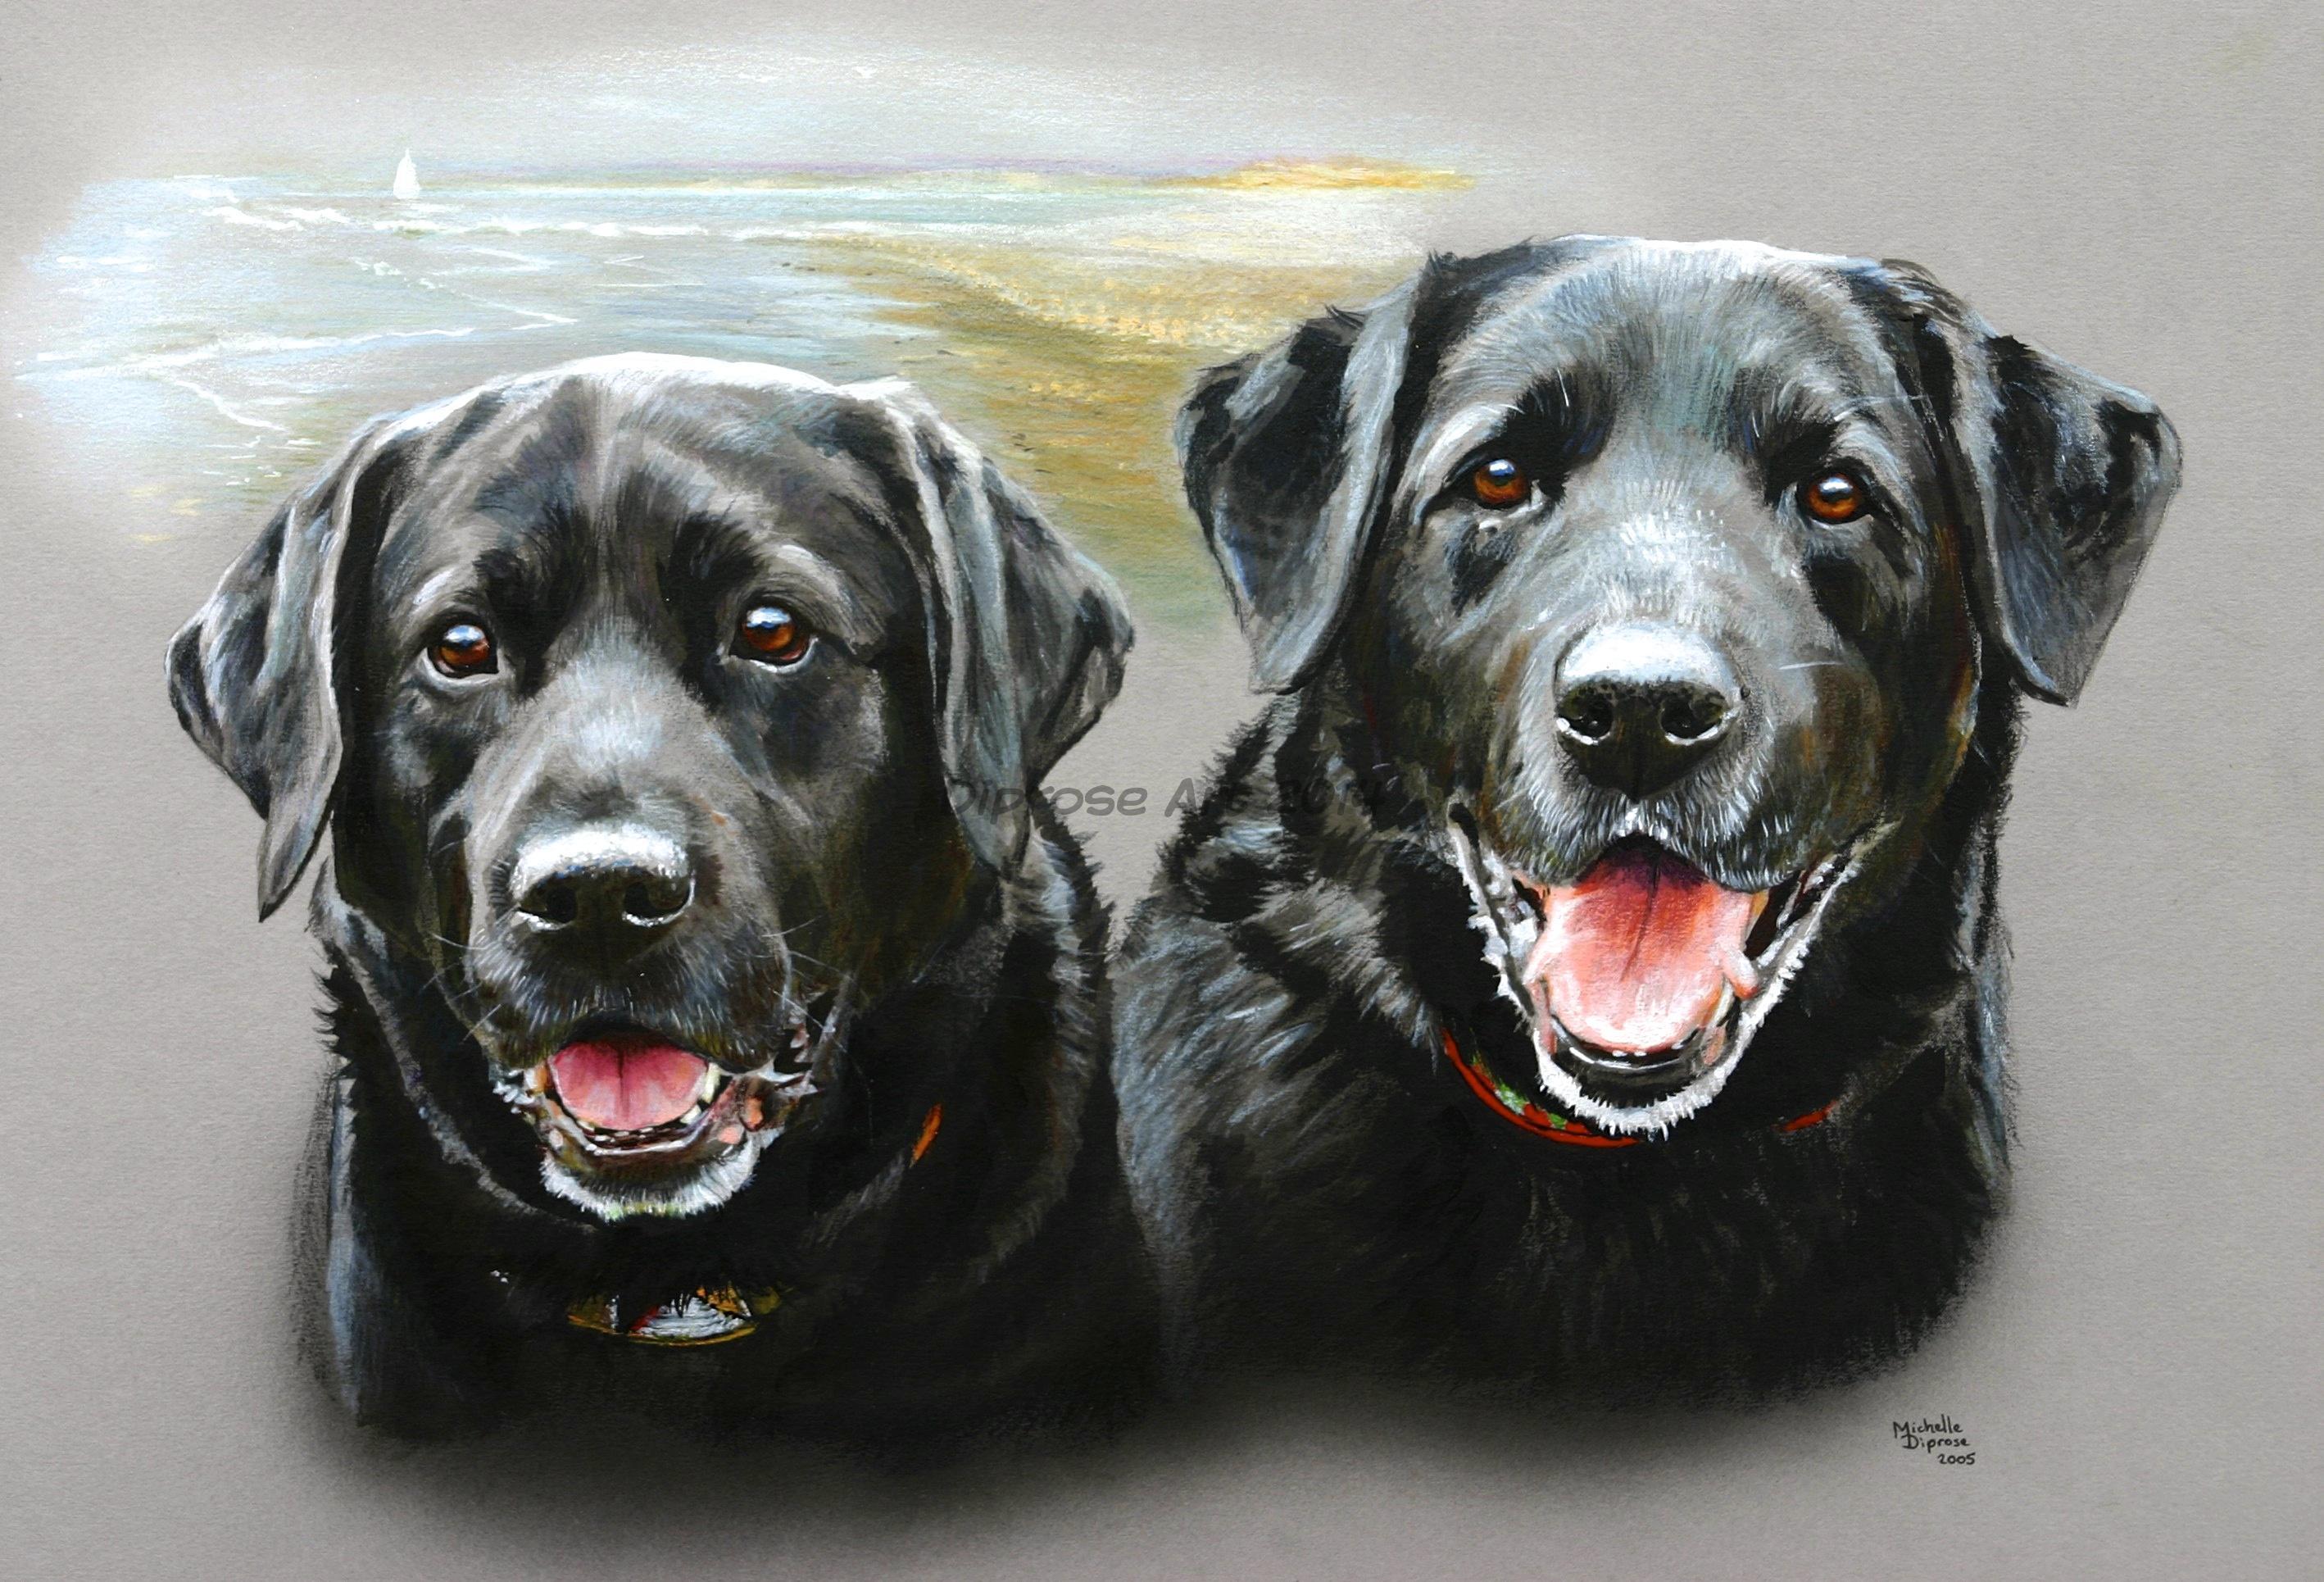 Black dog portrait photo